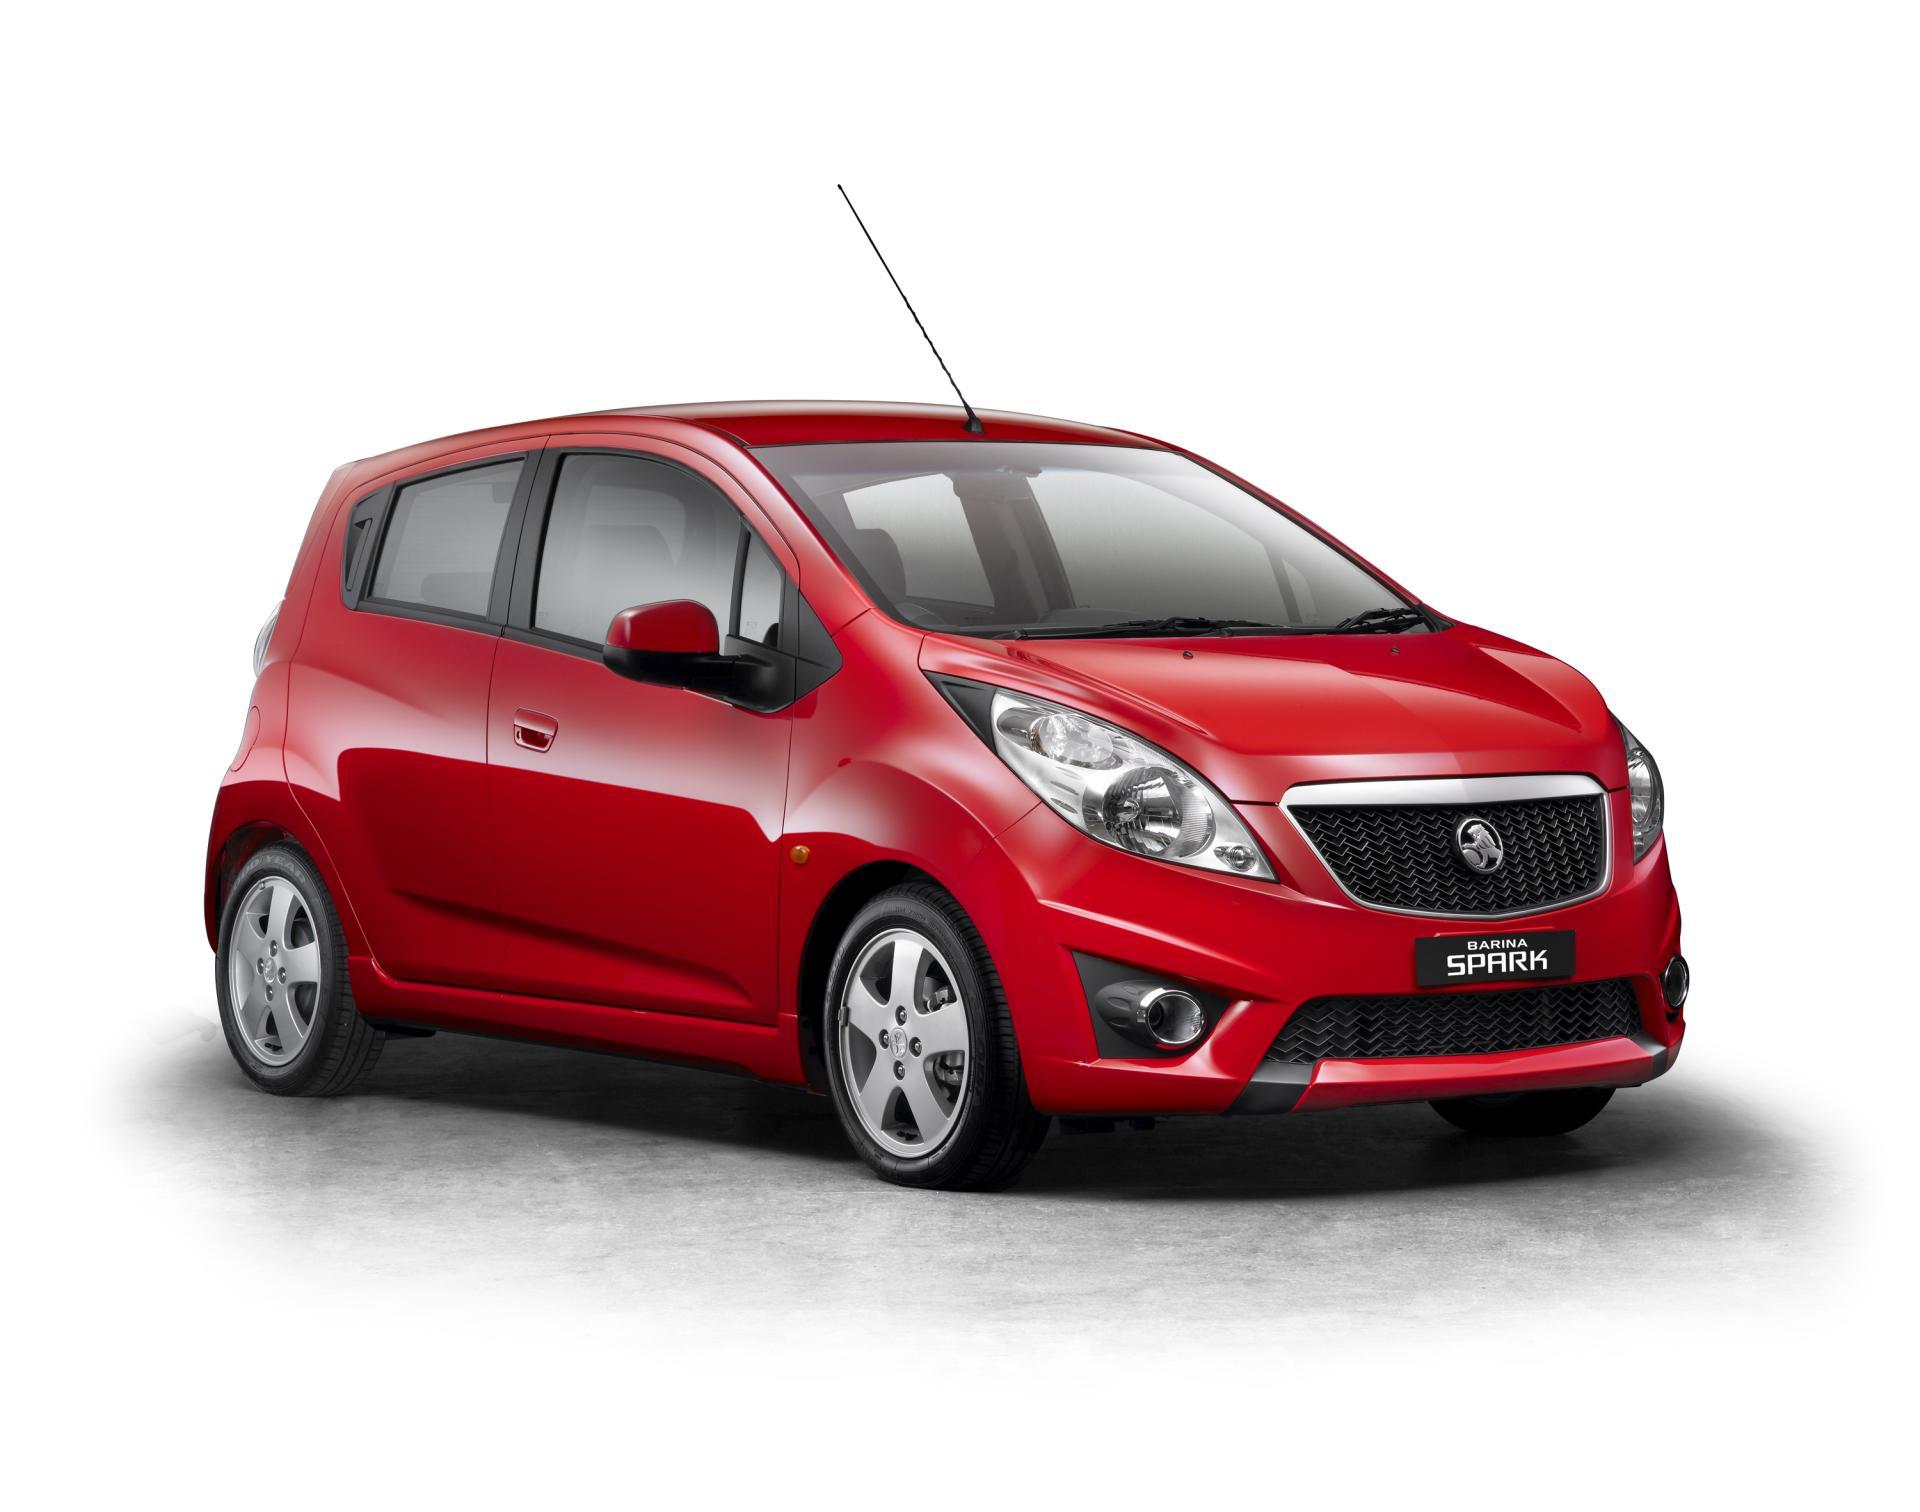 2011 Holden Barina Spark Image Http Www Conceptcarz Com